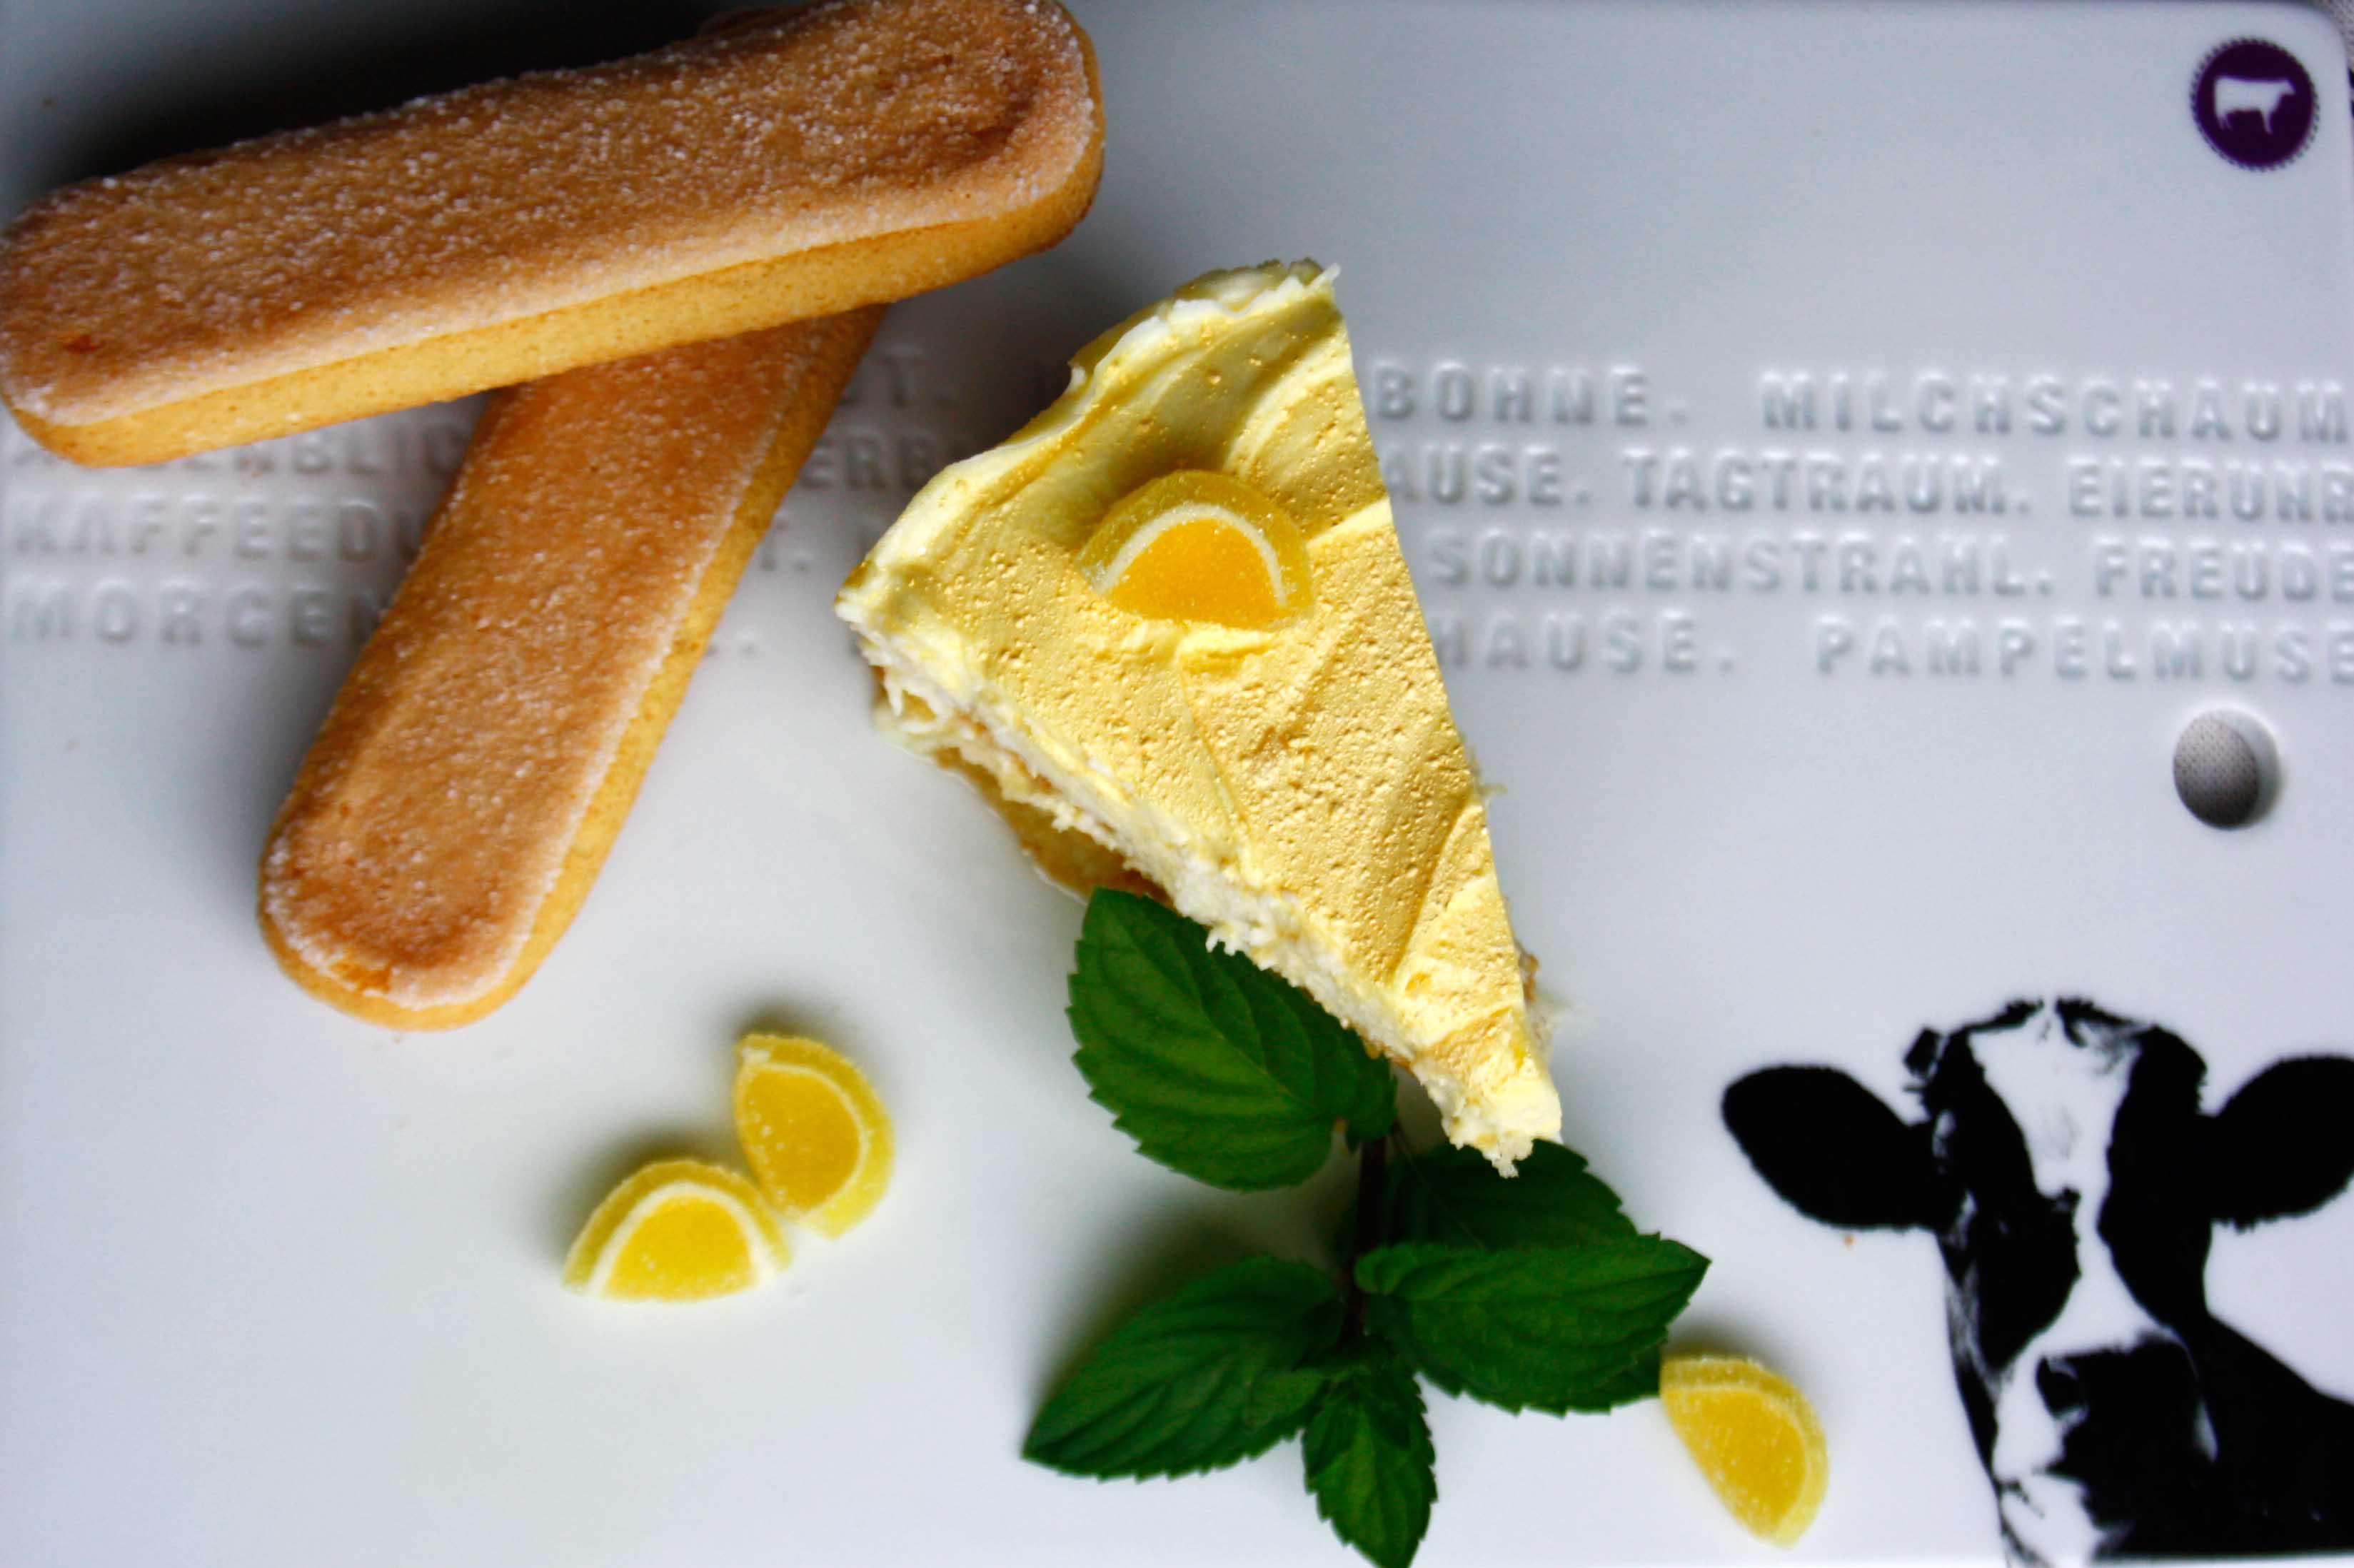 Zitronen Tiramisu // Tiramisu with Lemon and Limoncello by http://babyrockmyday.com/zitronen-tiramisu/